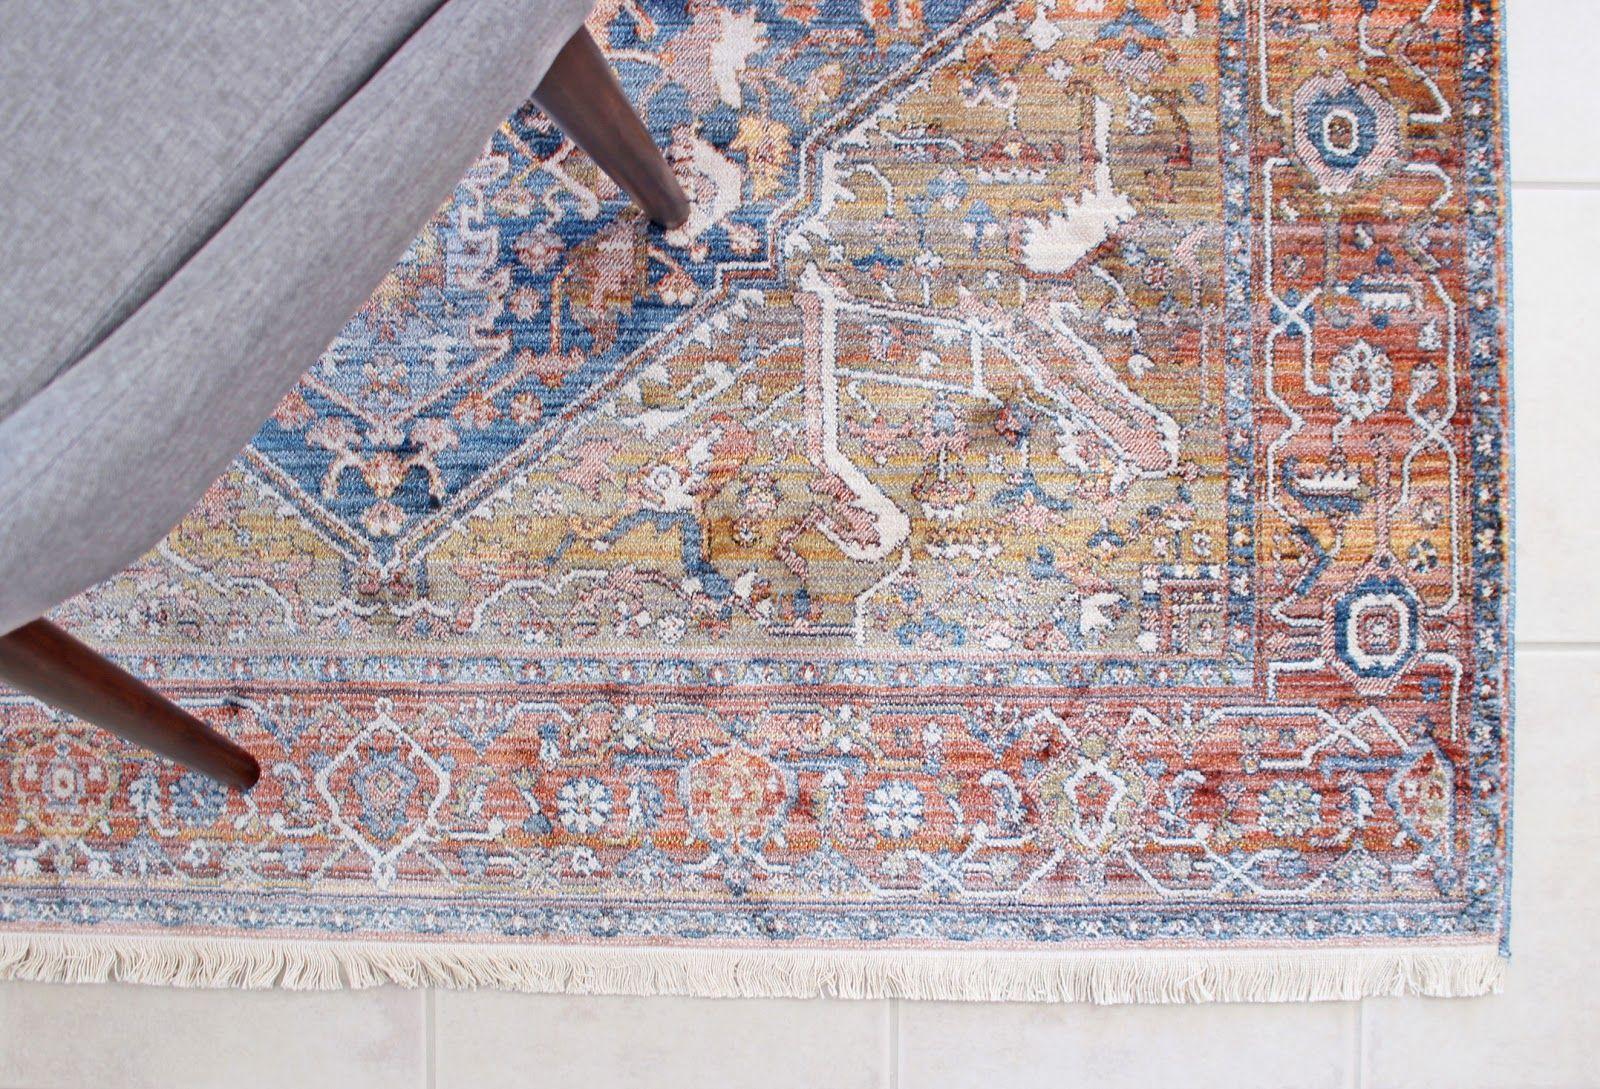 Credenza La Dolce Vita : Am dolce vita vintage style rugs rug edessa tribal